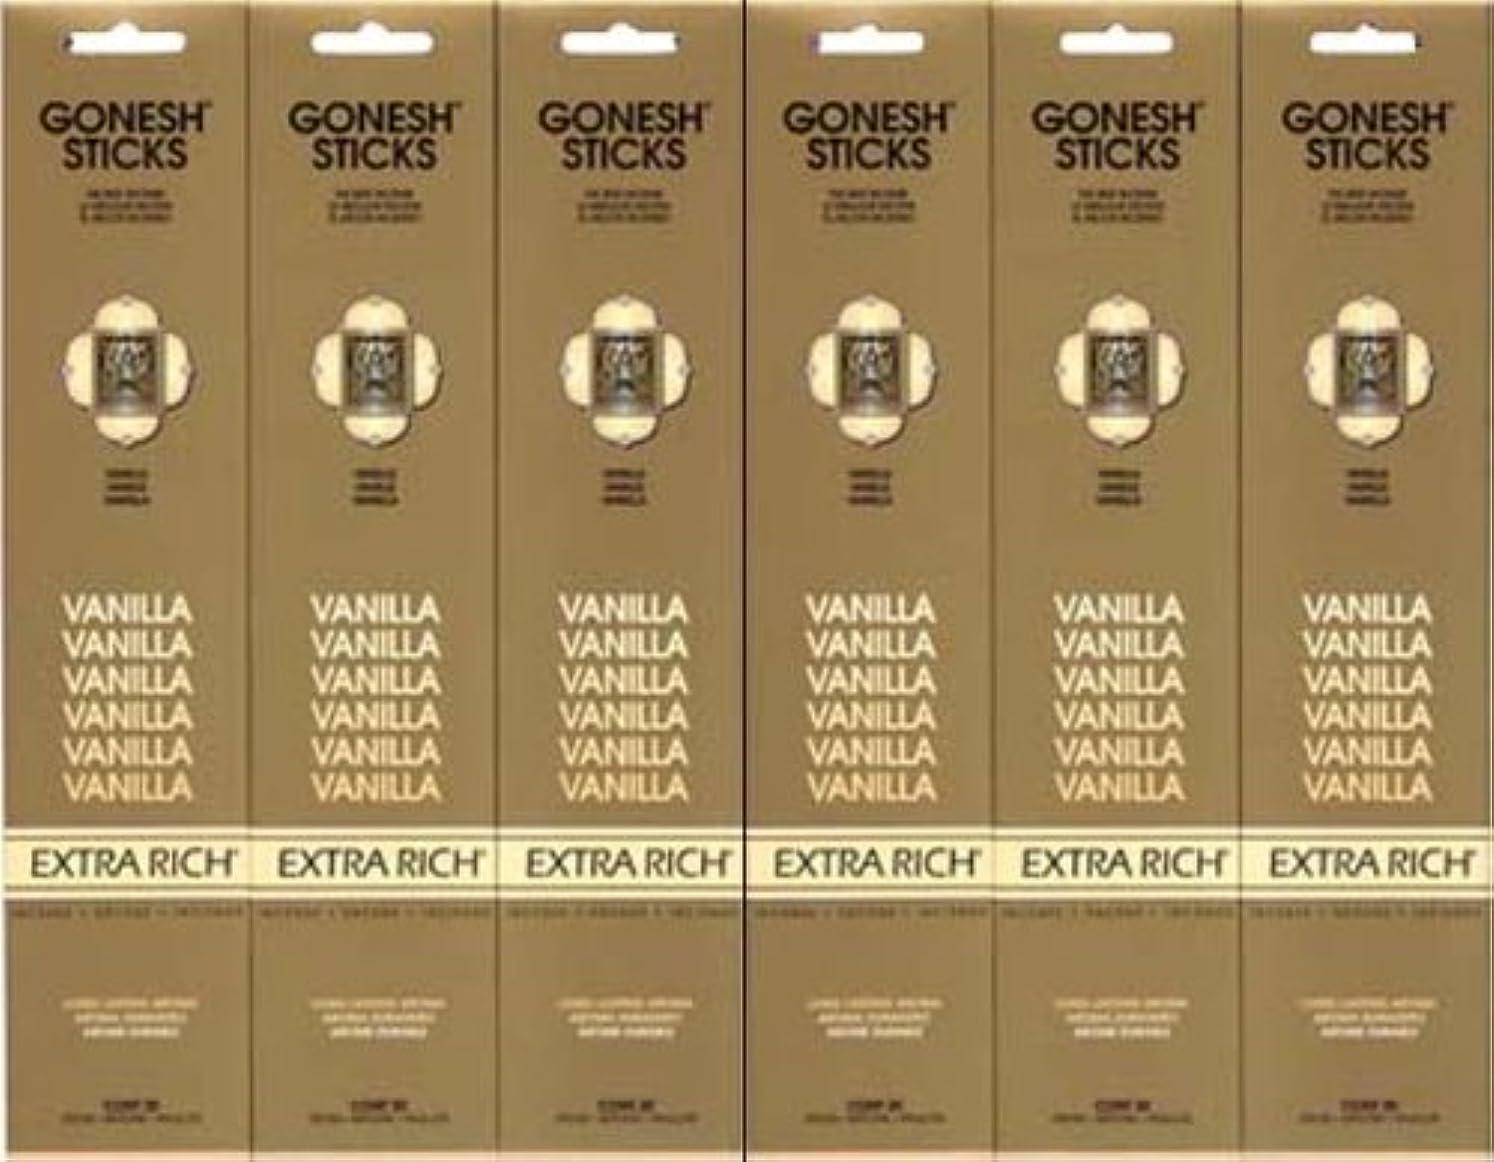 GONESH  VANILLA バニラ  20本入り X 6パック (120本)